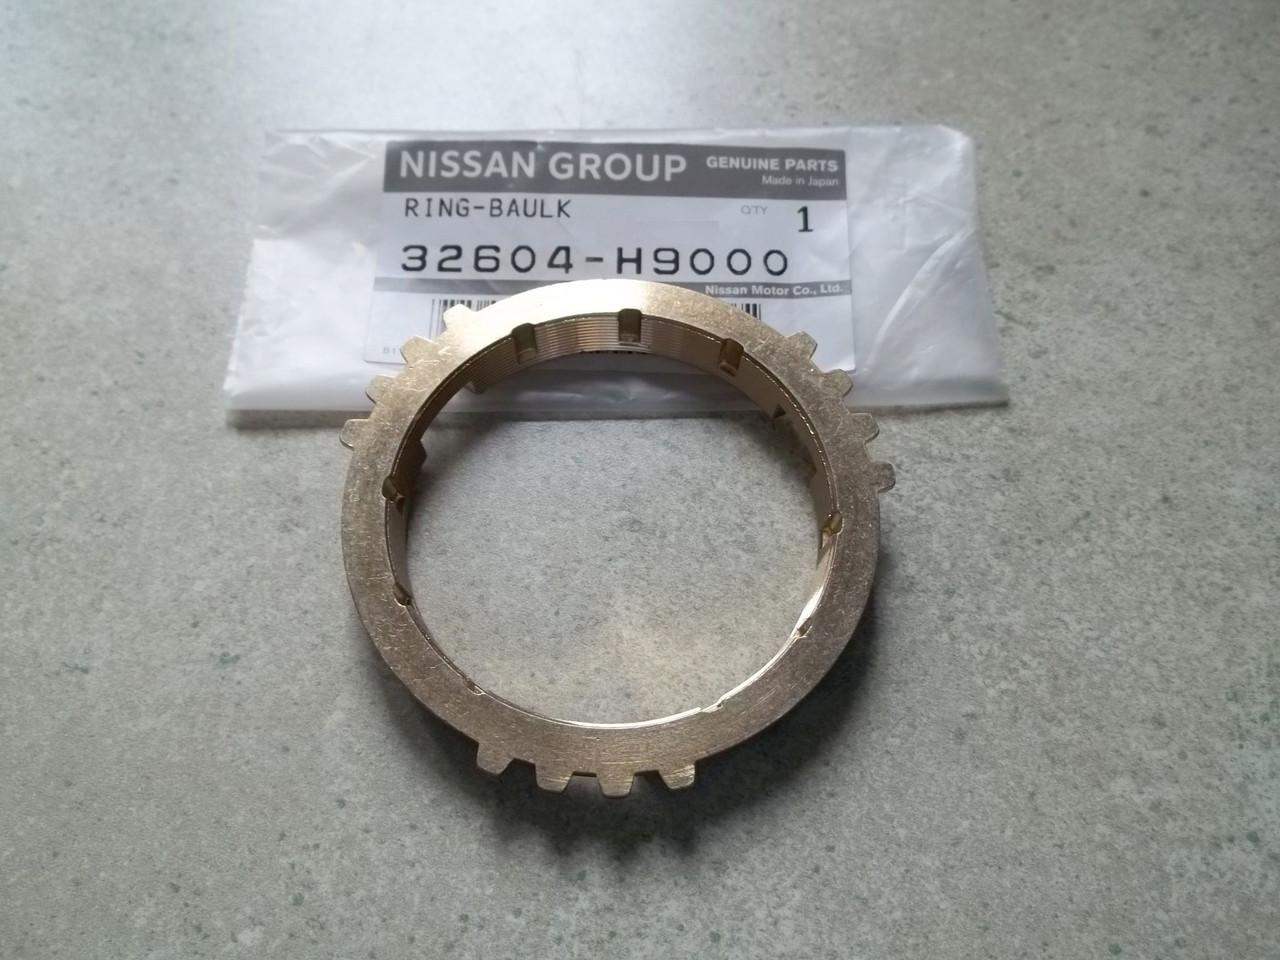 32604-H9000